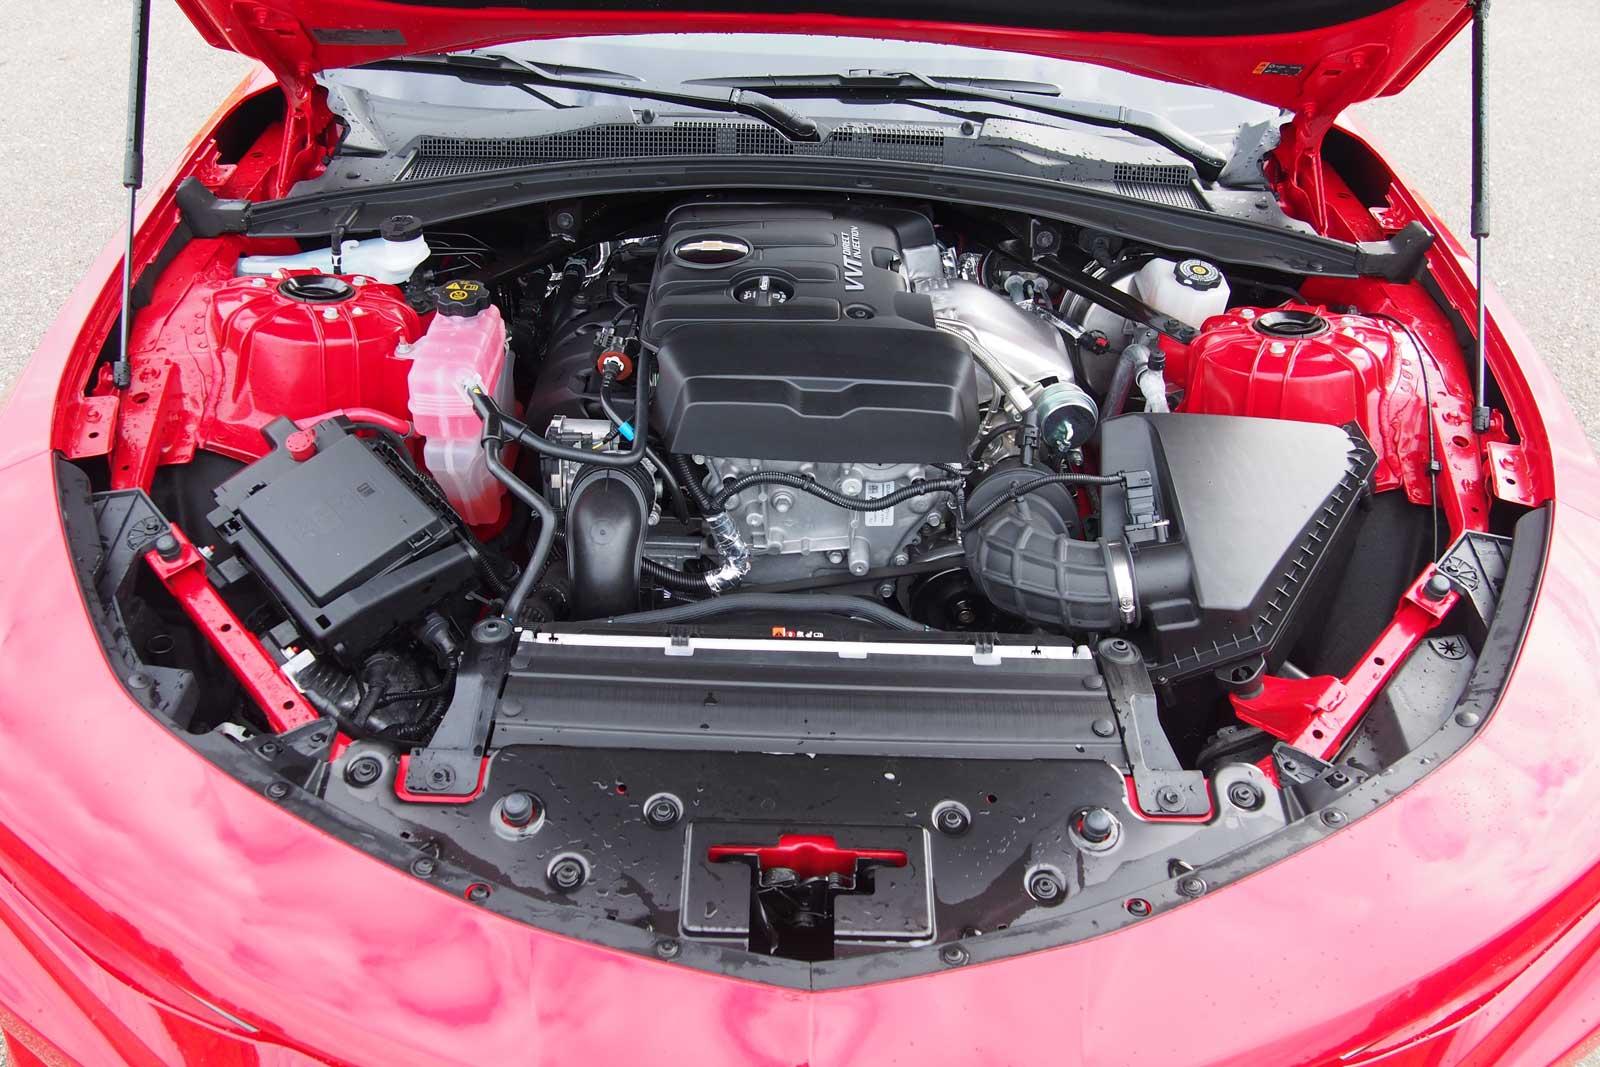 2016-Chevrolet-Camaro-1LT-Engine-01